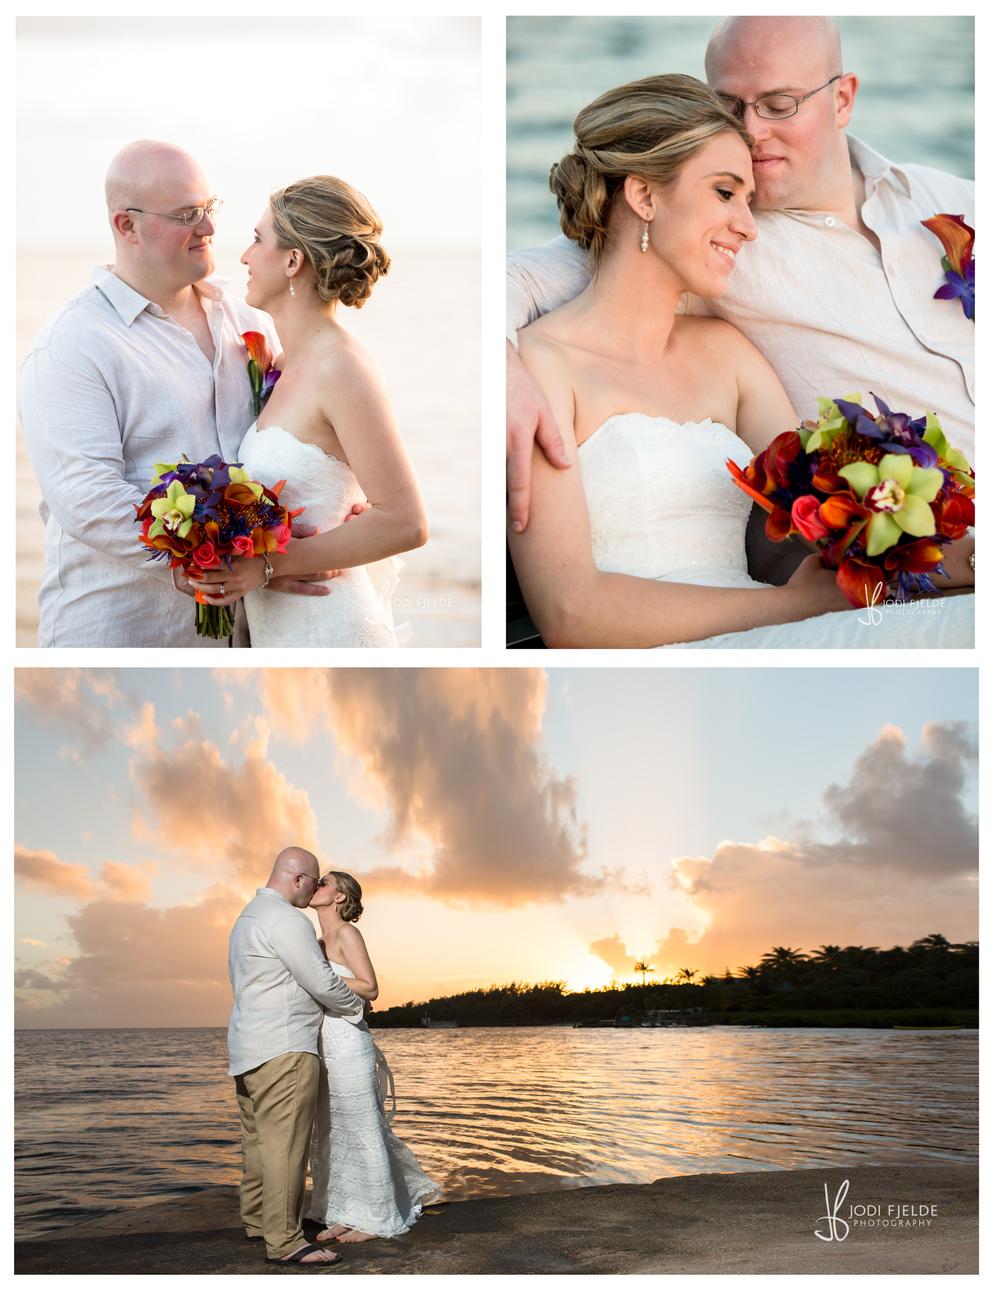 Cocconut_Cove_&_ Marina_ wedding_Kayla_and_Patrick 25.jpg